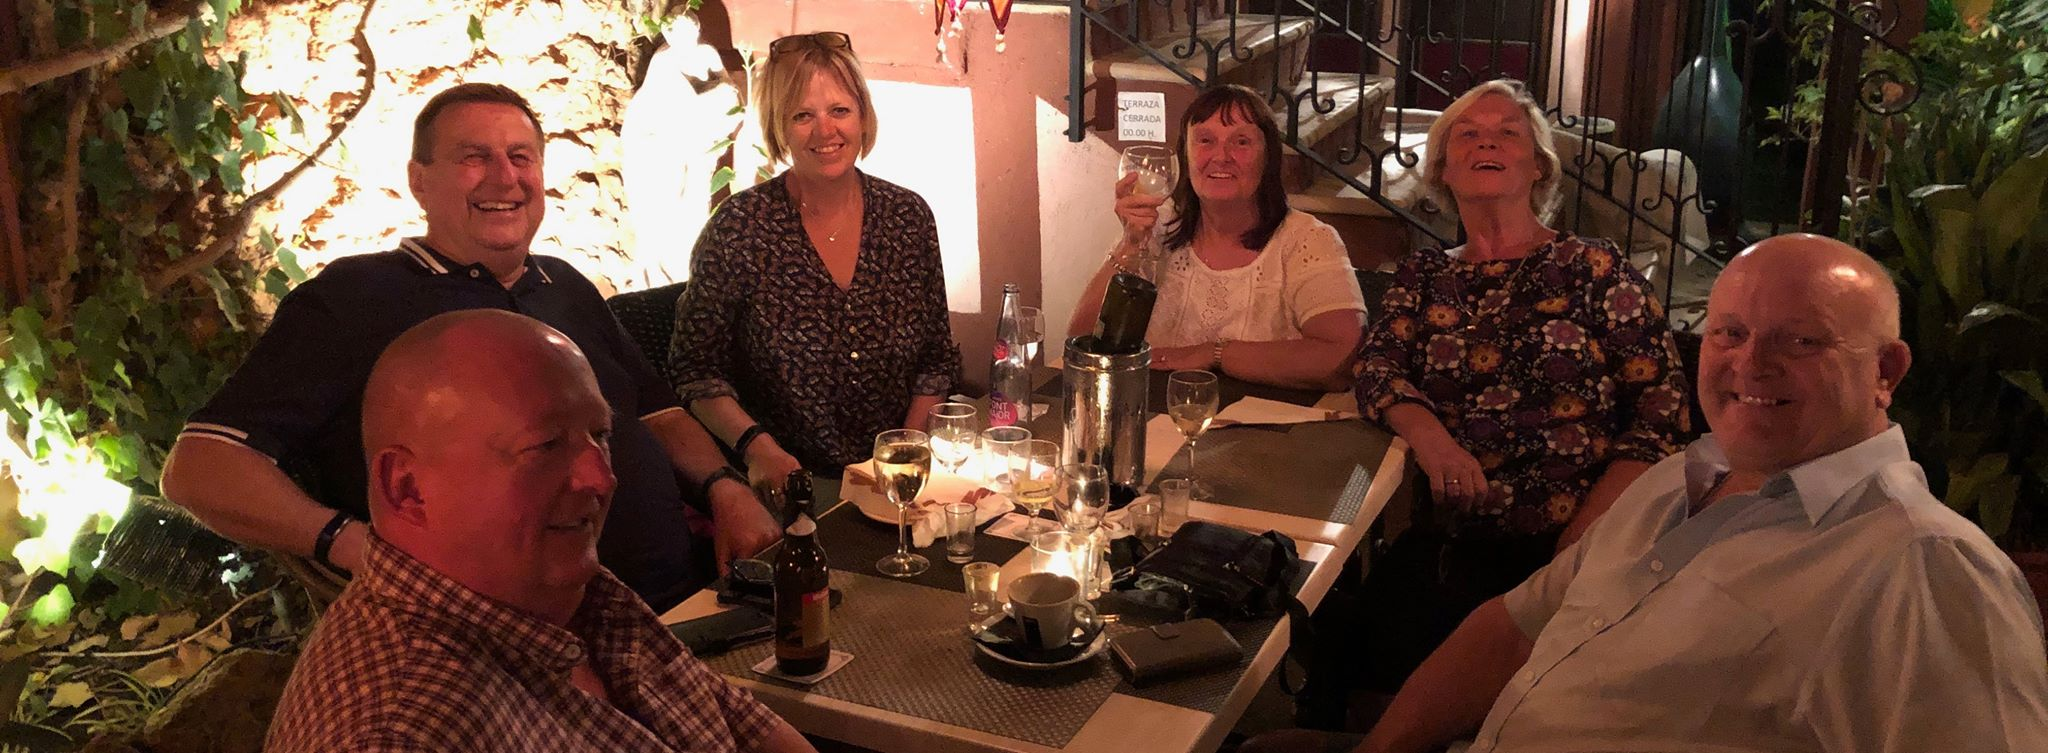 Cruise Meal in Mallorca